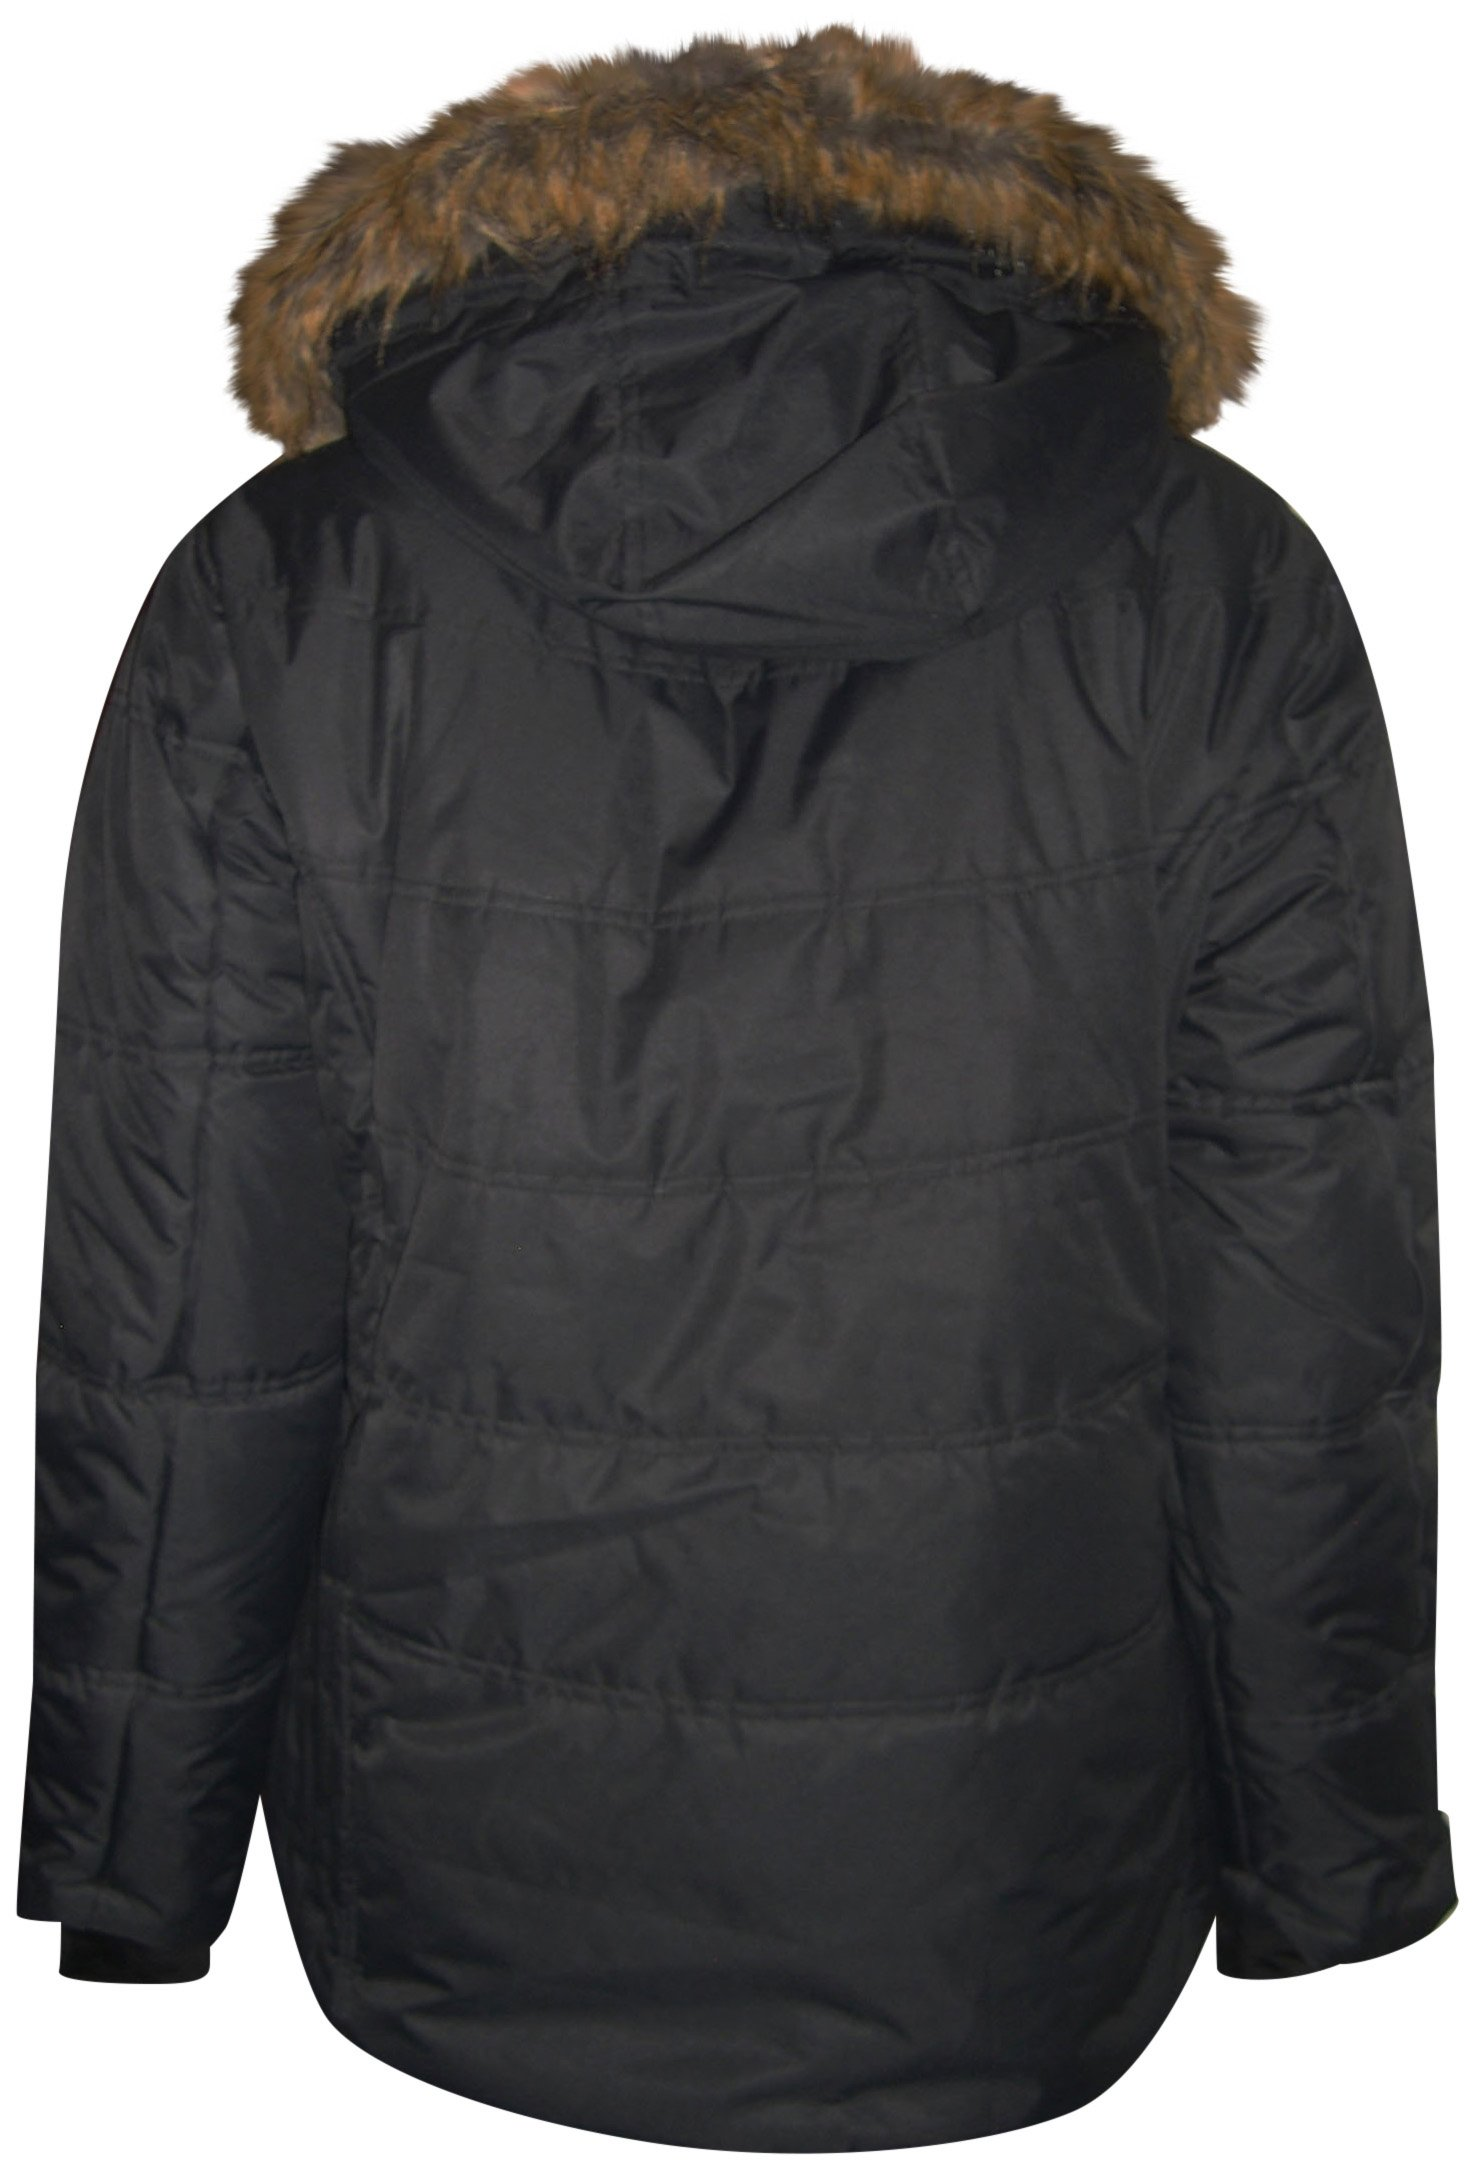 Pulse Women's Plus Extended Size Ski Coat Aspens Calling (3X, Black) by Pulse (Image #2)